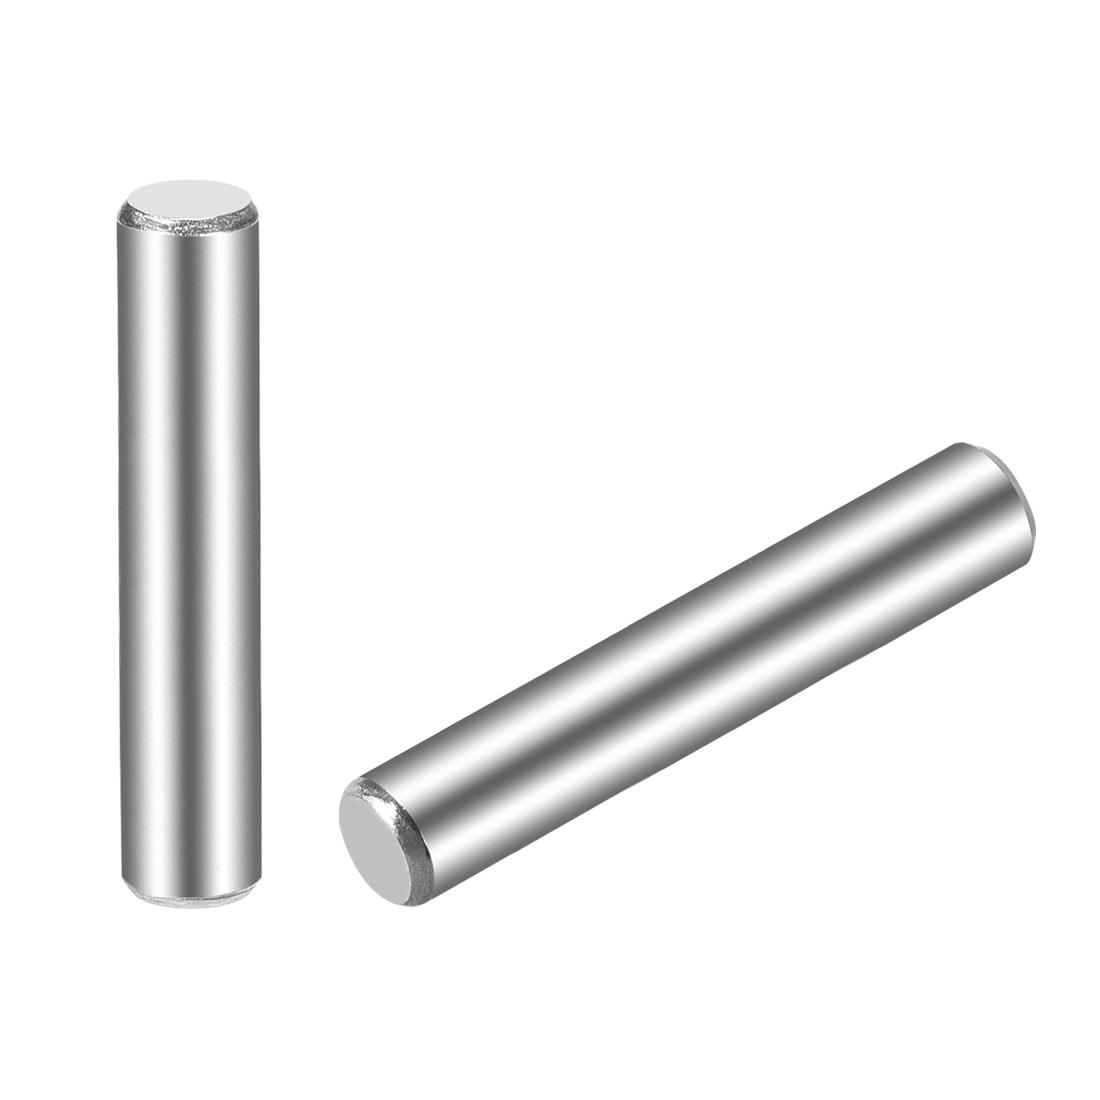 15Pcs 5mm x 35mm Dowel Pin 304 Stainless Steel Shelf Support Pin Fasten